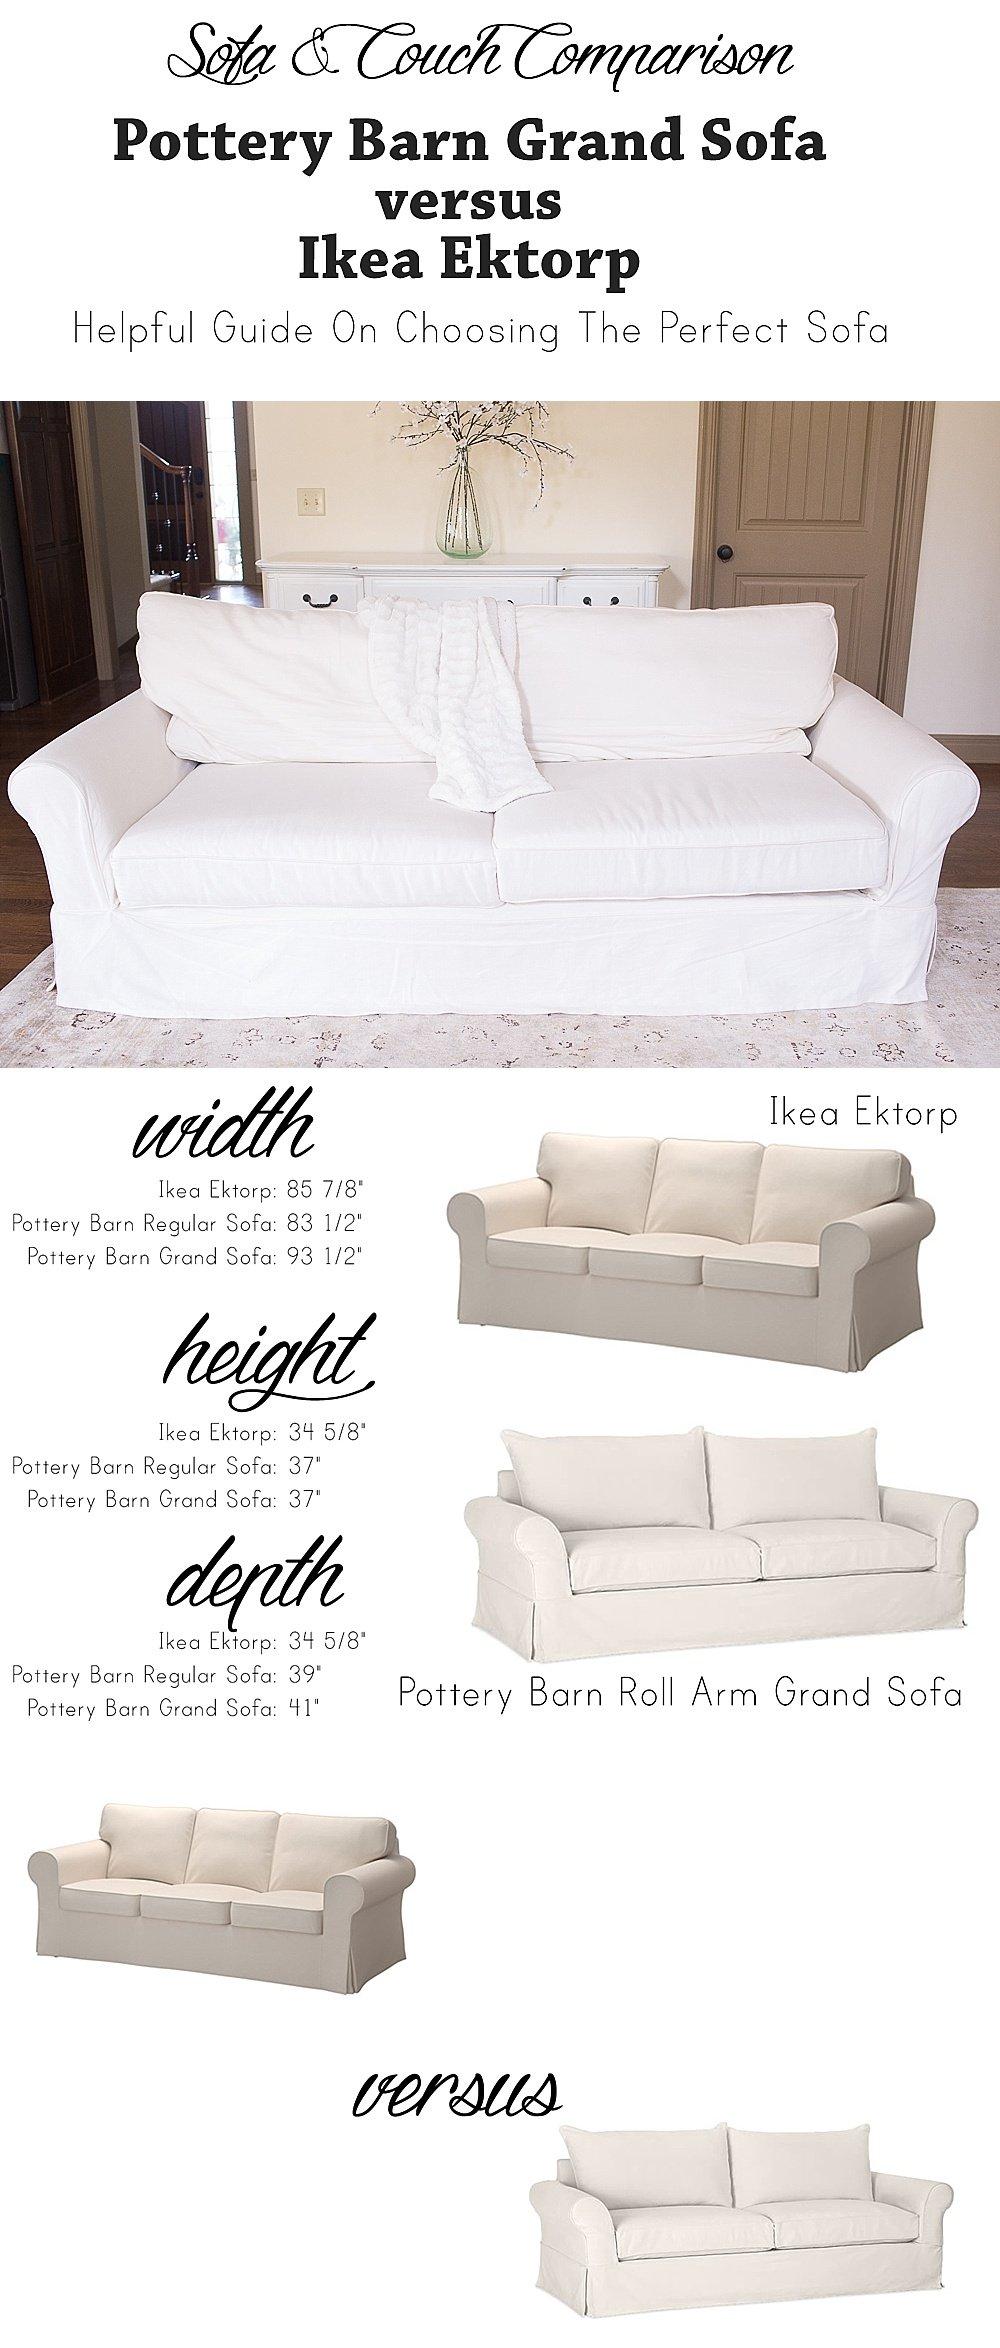 Ikea versus Pottery Barn Sofa how to choose a couch and sofa | 10 Tips on How to Choose a Couch: Pottery Barn versus Ikea Sofa featured by top US lifestyle blogger, Sengerson